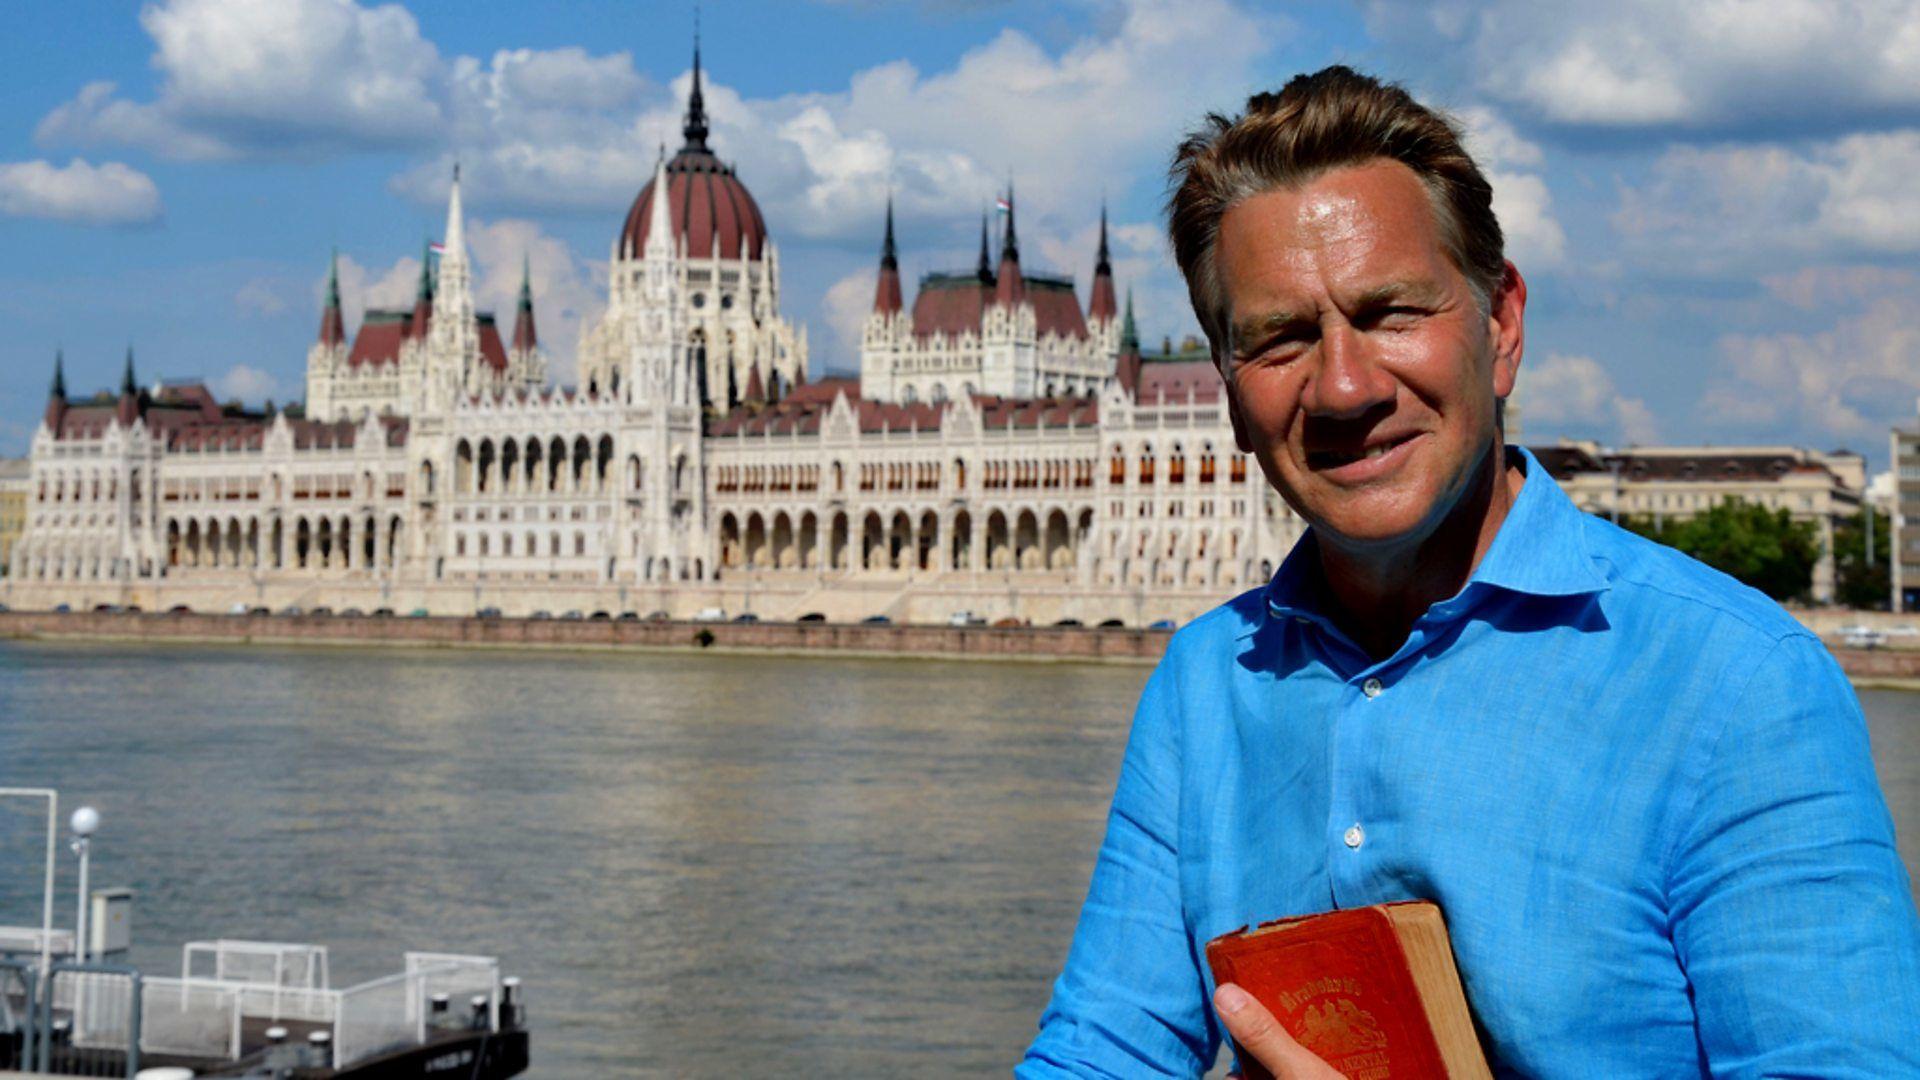 Большое железнодорожное путешествие по континенту — s01e02 — Hungary to Austria